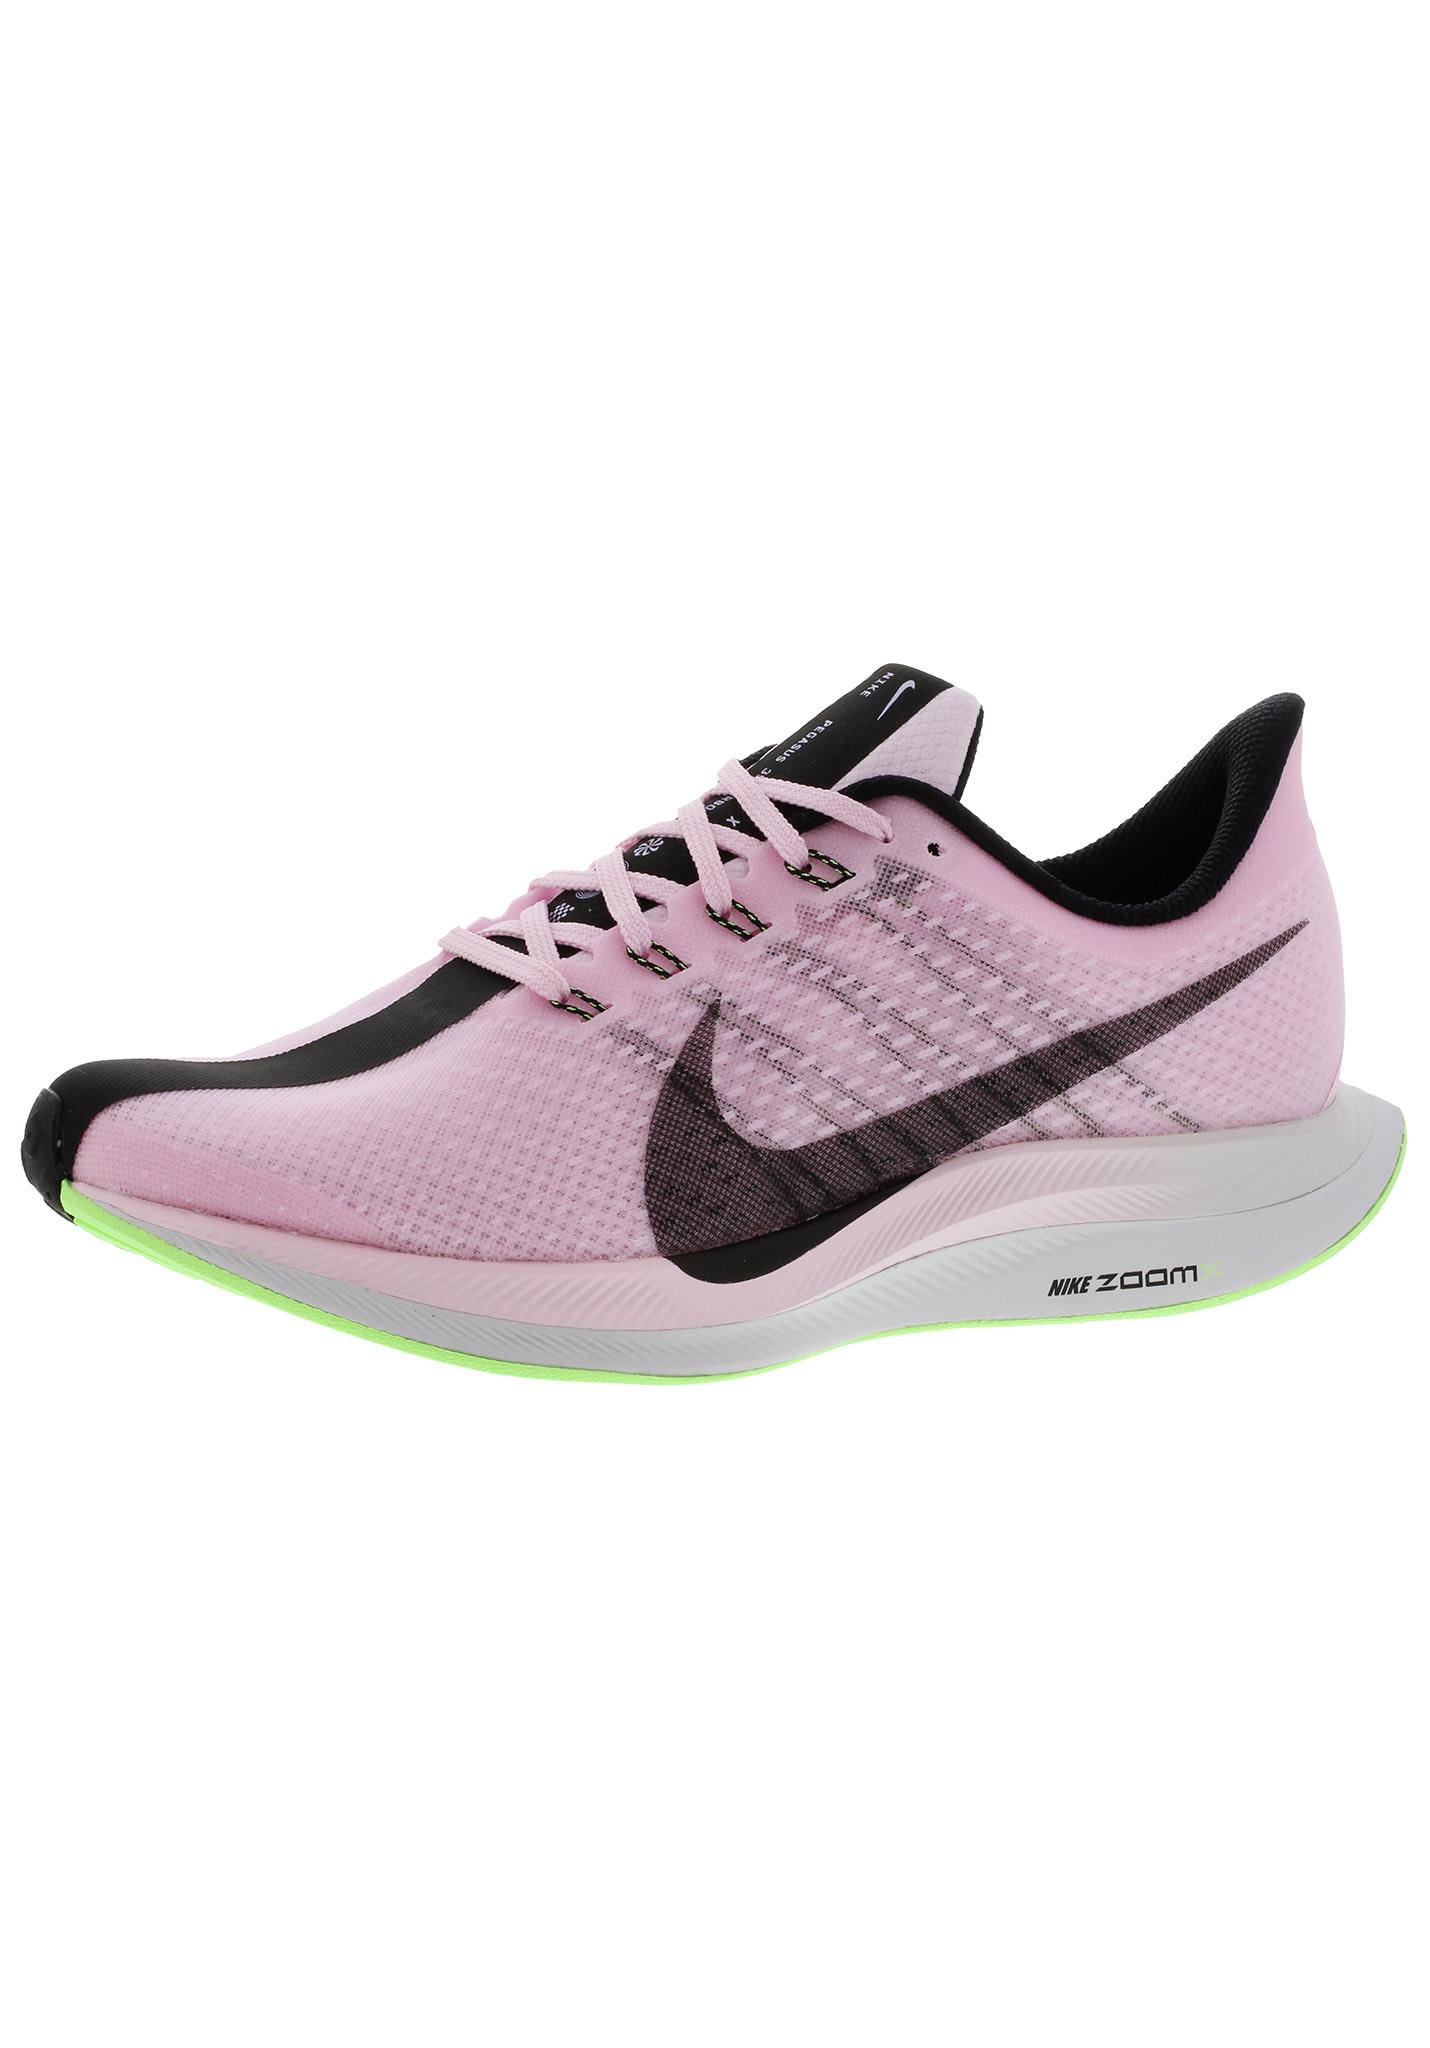 revendeur 7eafd 7bd7d Nike Zoom Pegasus Turbo - Running shoes for Women - Pink